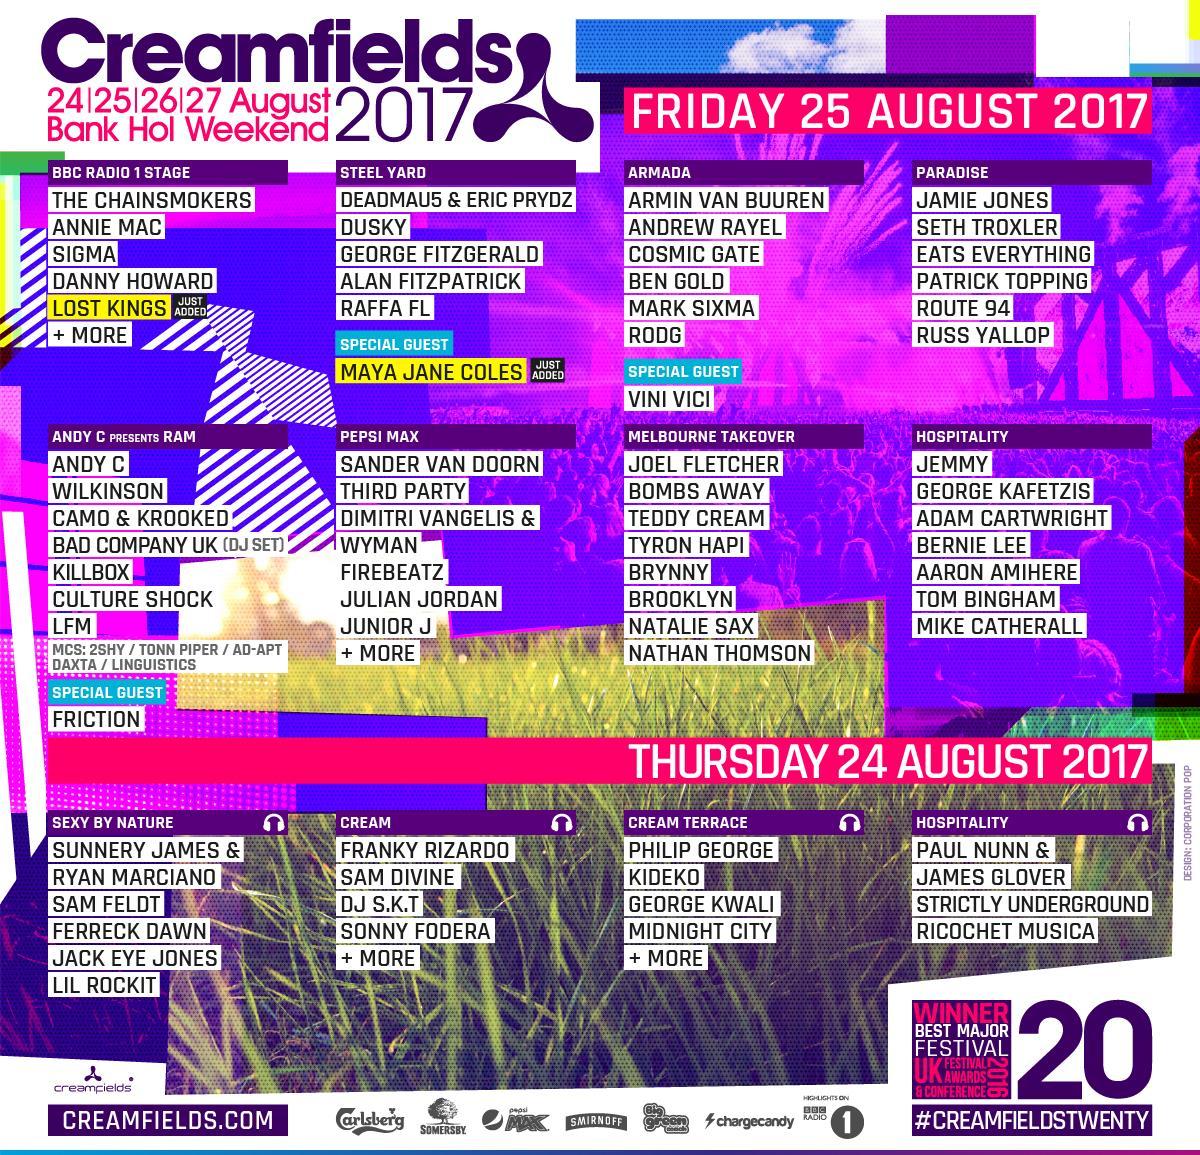 Creamfields 2017 Liverpool Old Skool